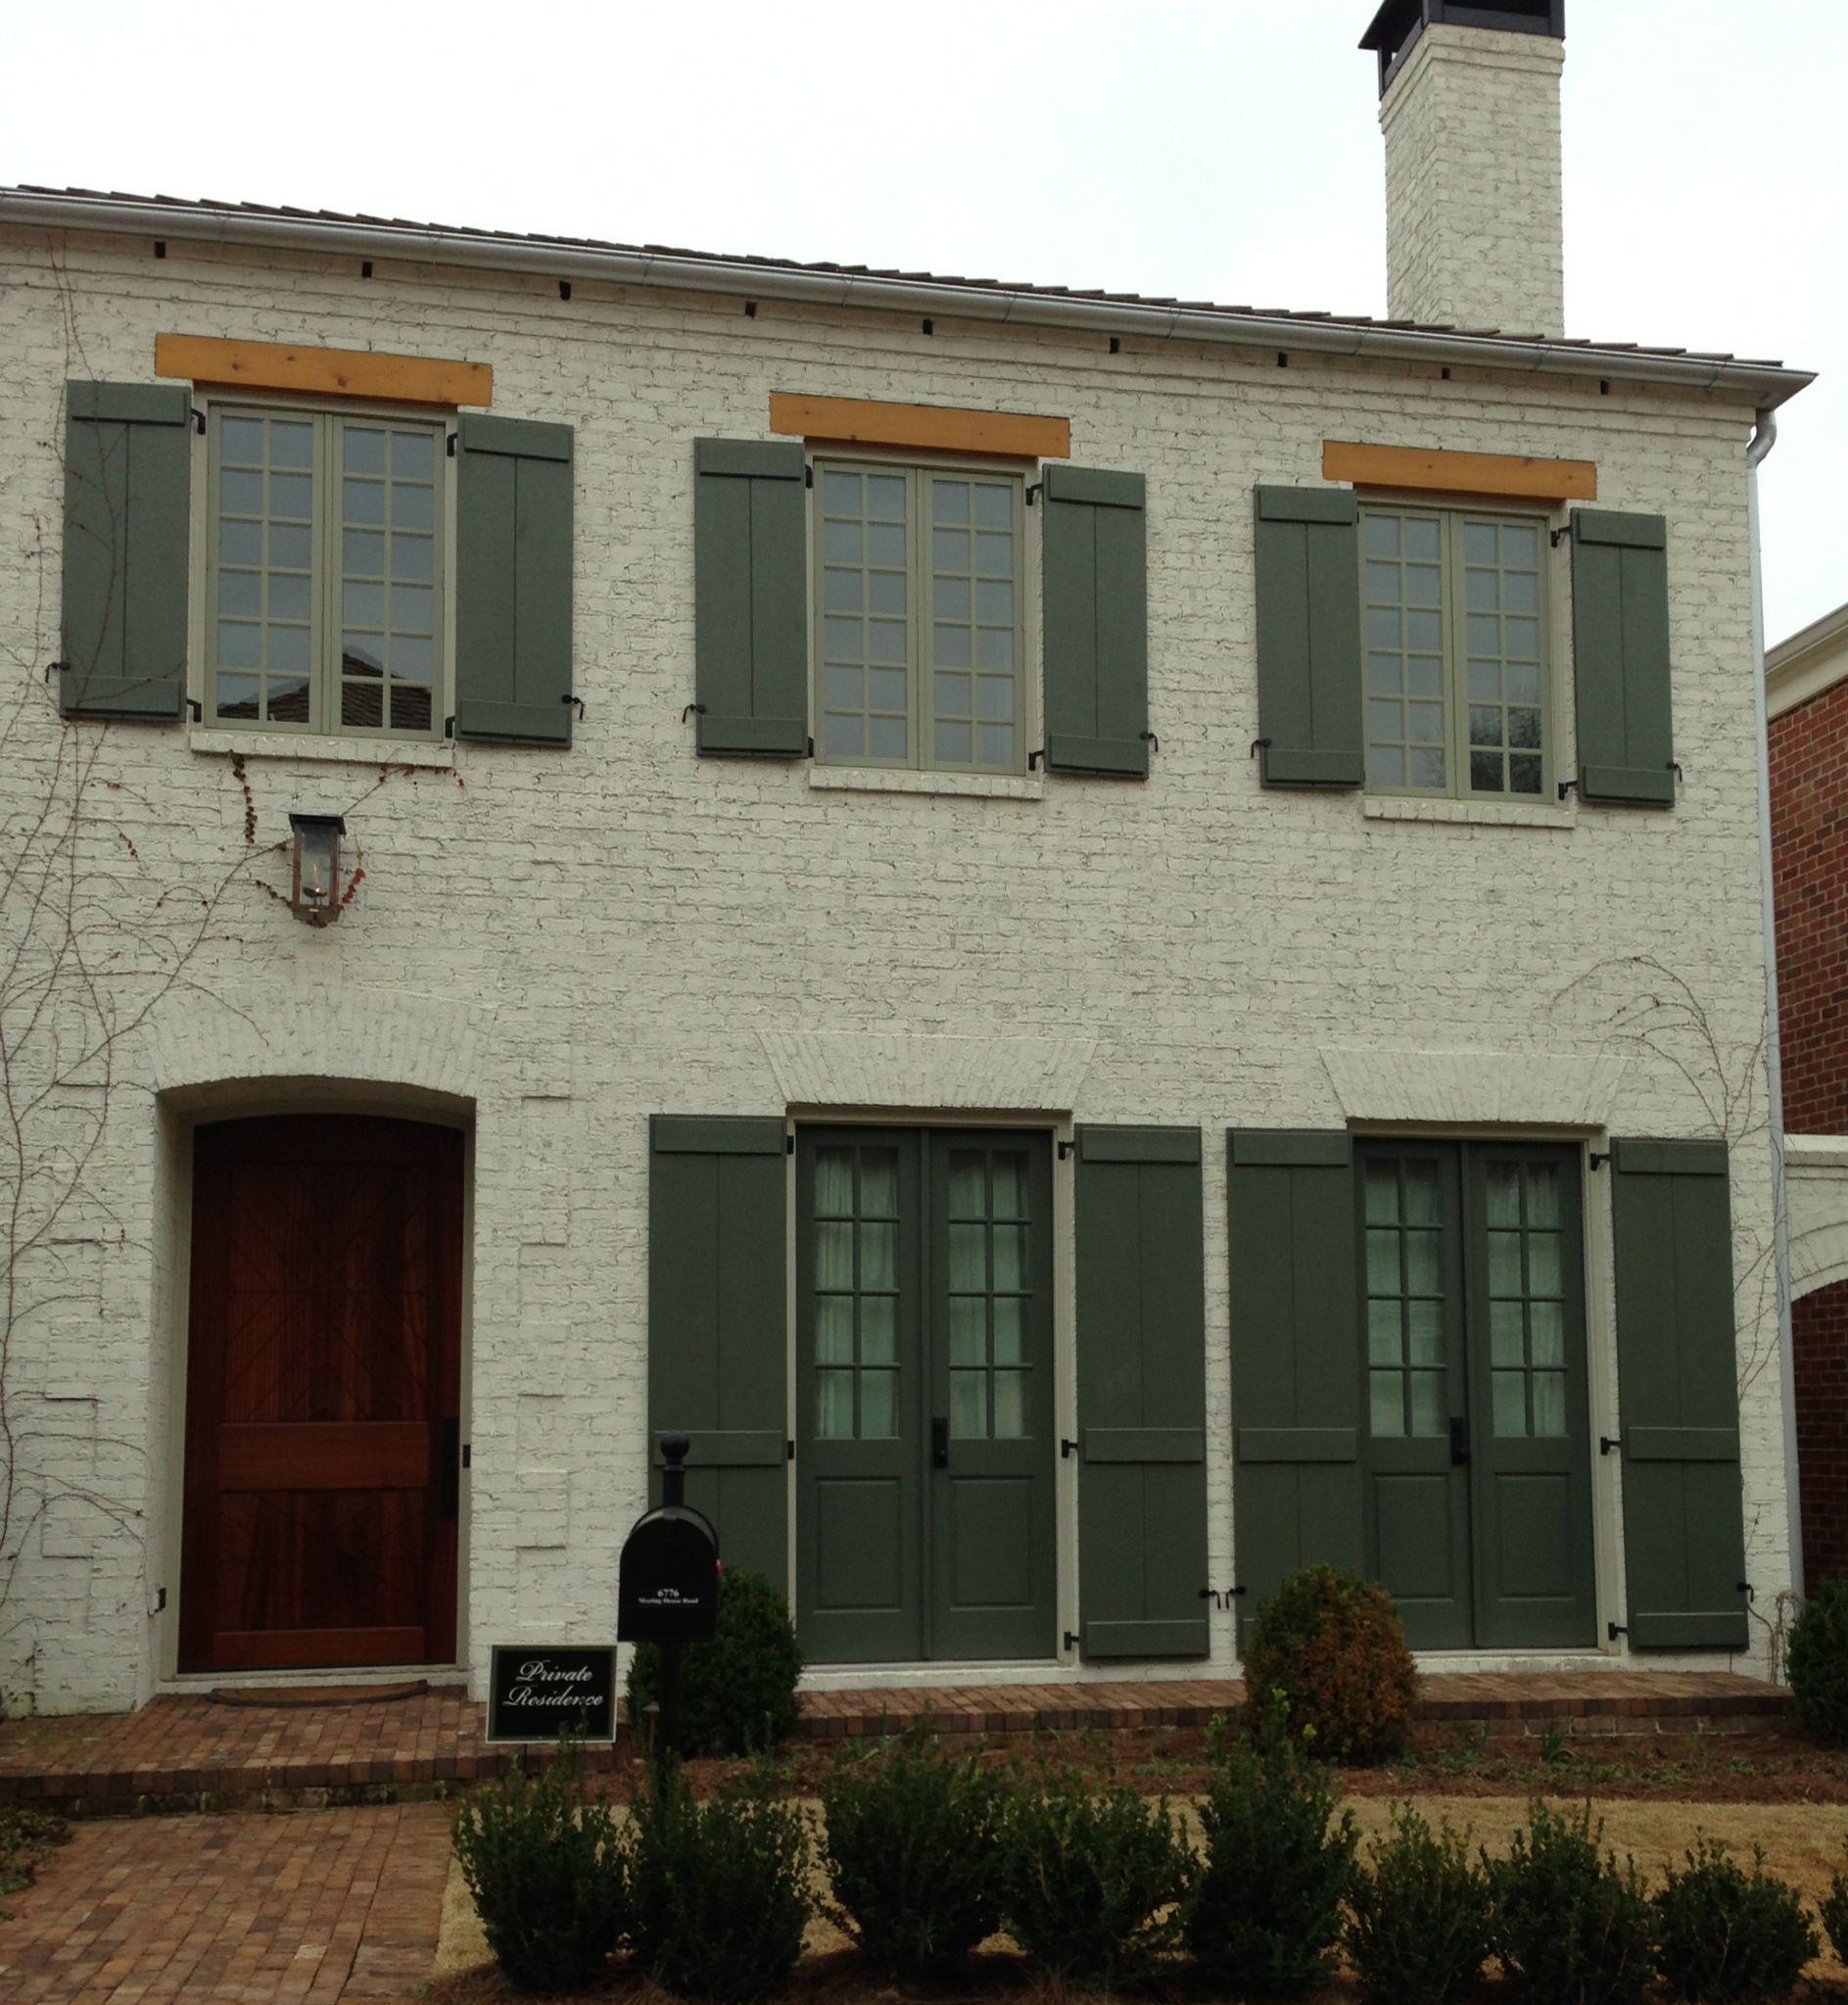 Exterior painted brick | New house ideas | Pinterest on Brick Painting Ideas  id=46699